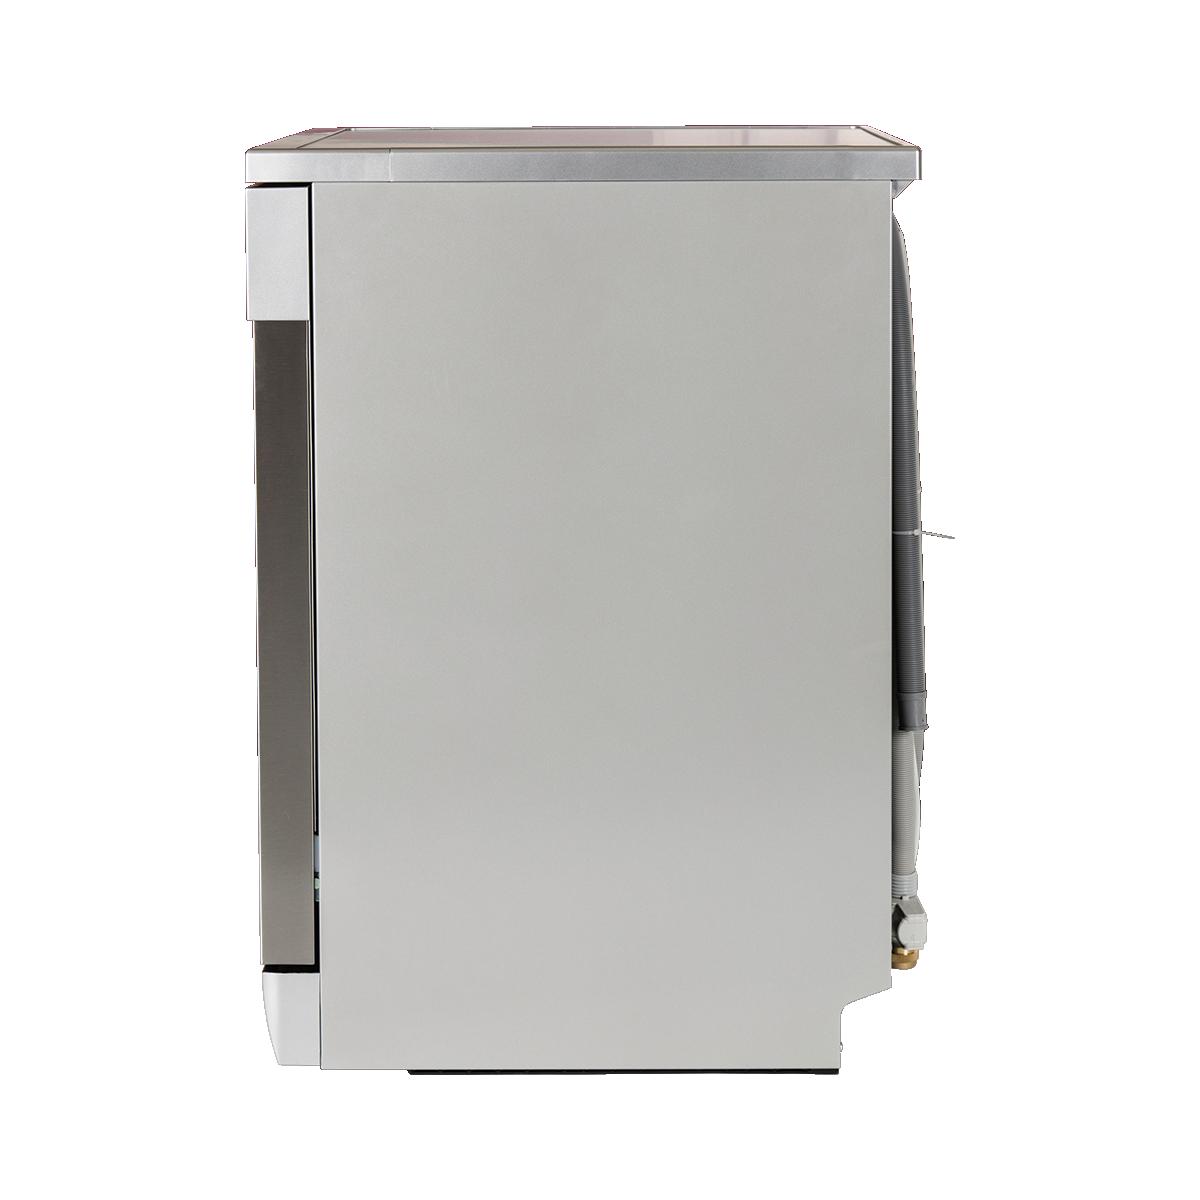 Astivita Limited | Dishwasher 45cm Freestanding SS 9